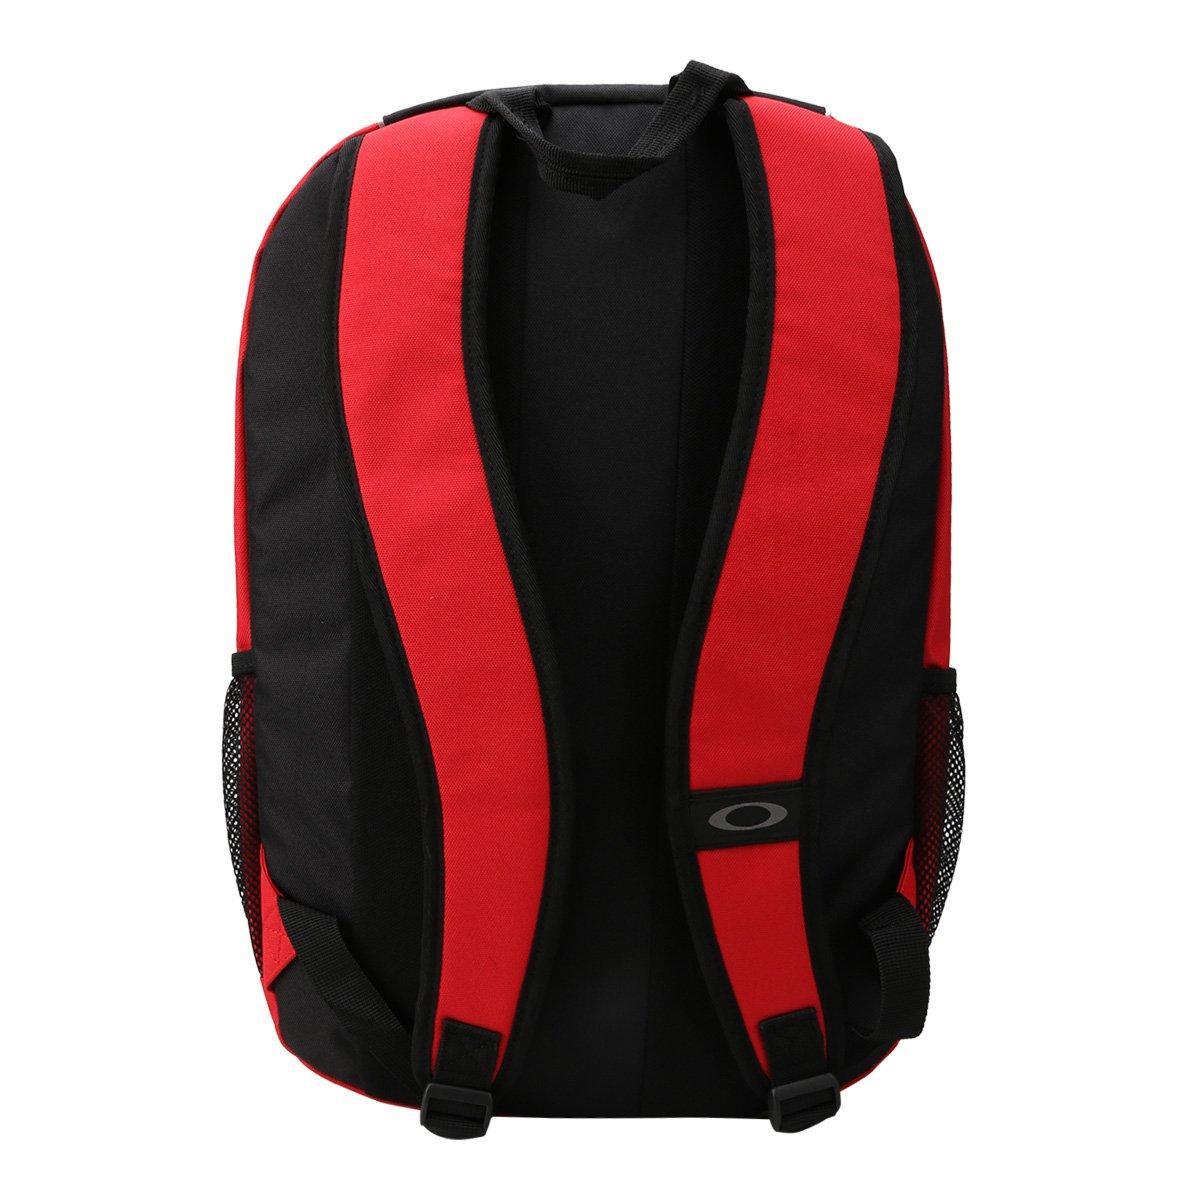 78cfde62899c3 Mochila Oakley Mod Enduro 20L 2.0 Masculina - Vermelho - Compre ...